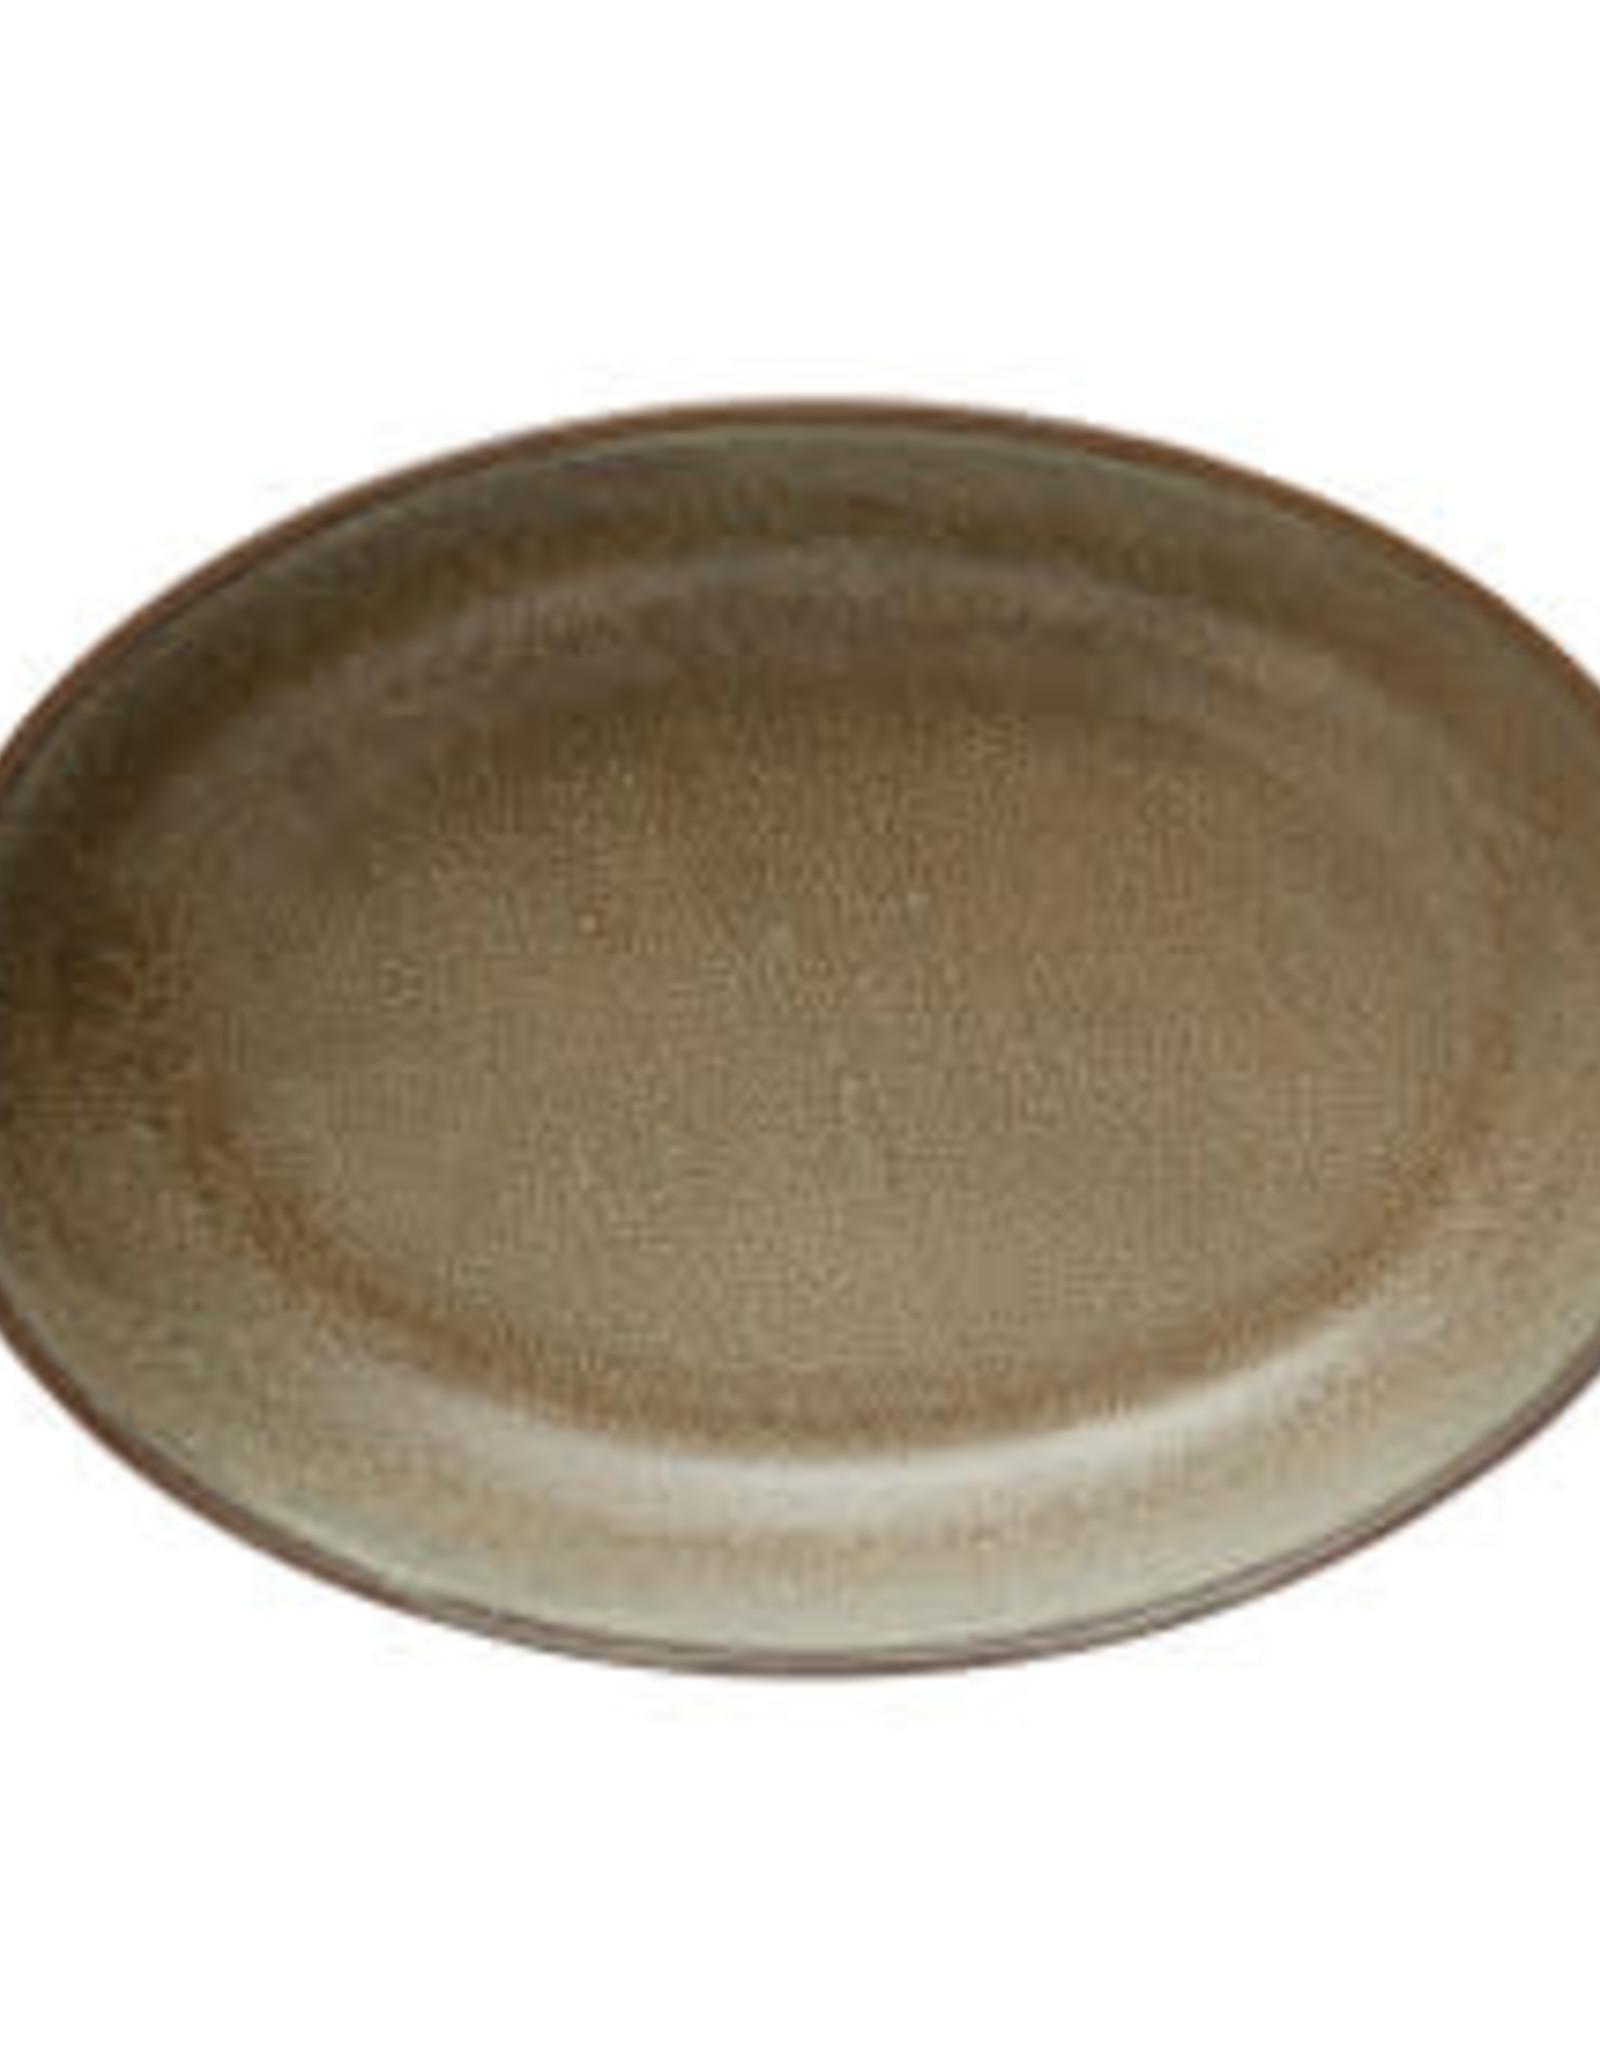 "Brown Reactive Glaze Stoneware Serving Platter L12"" W8"" H2"""